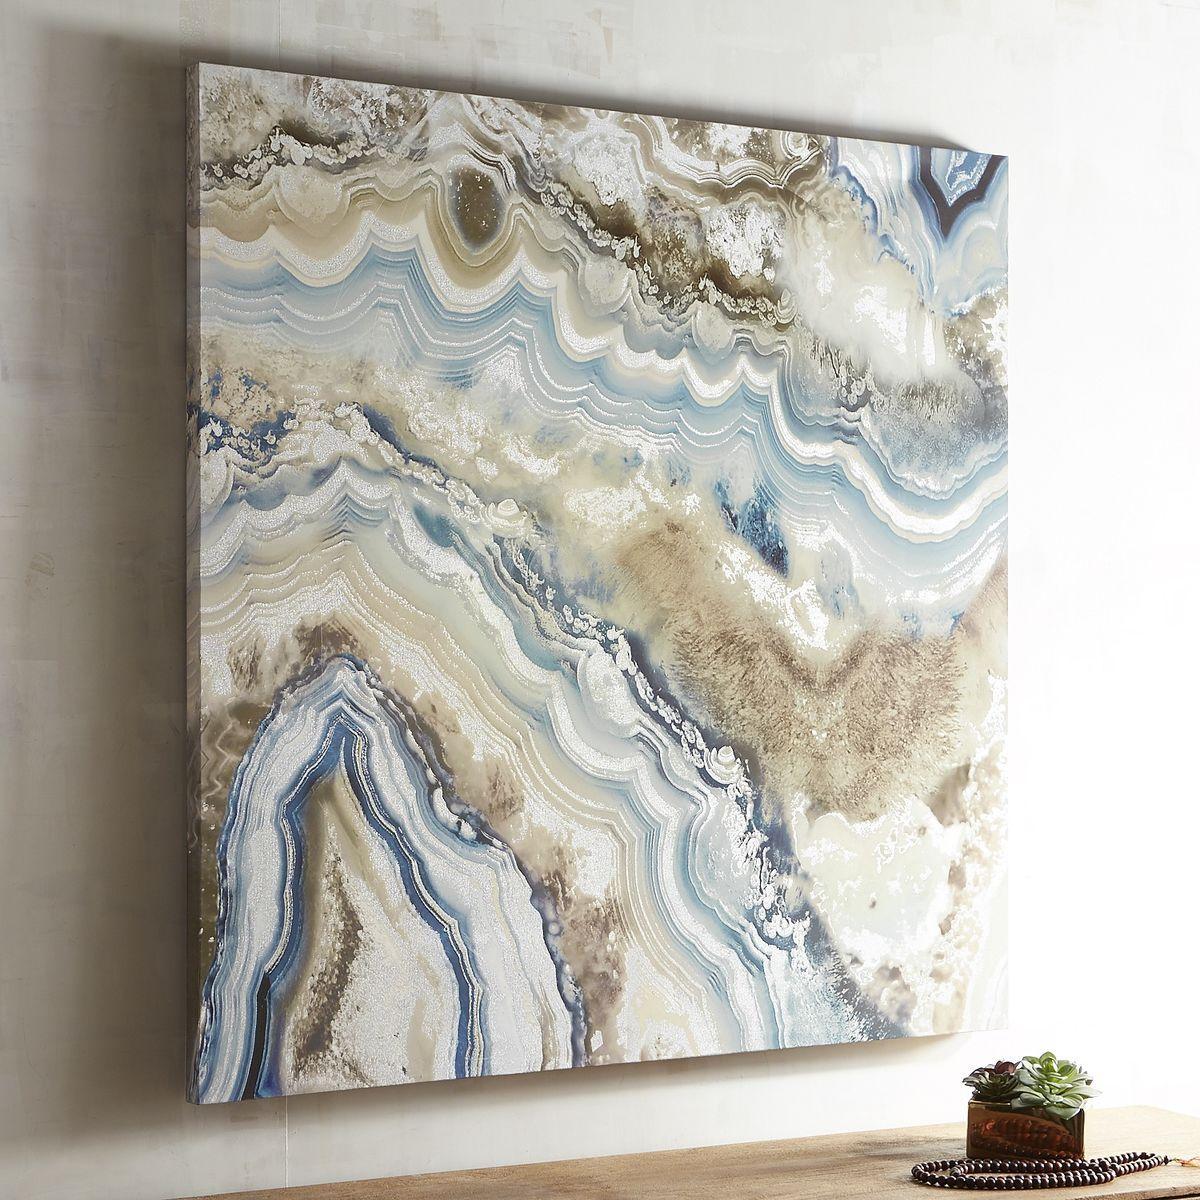 Agate pale blue abstract art pier imports акрил pinterest